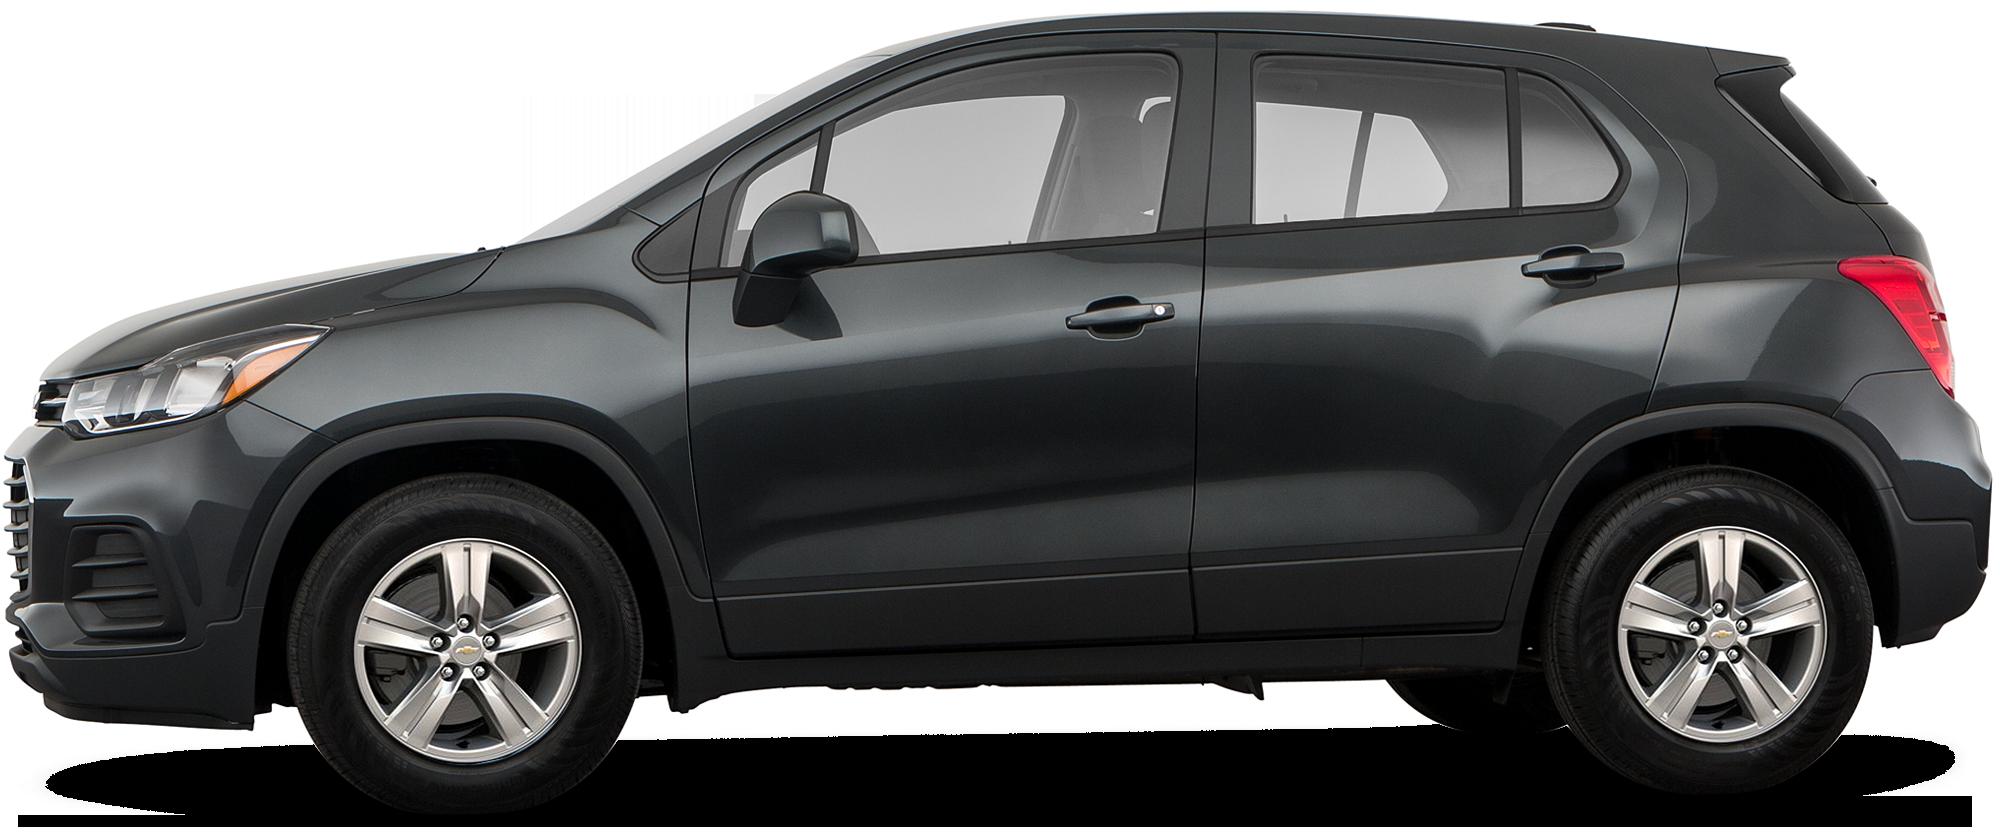 2022 Chevrolet Trax SUV LS